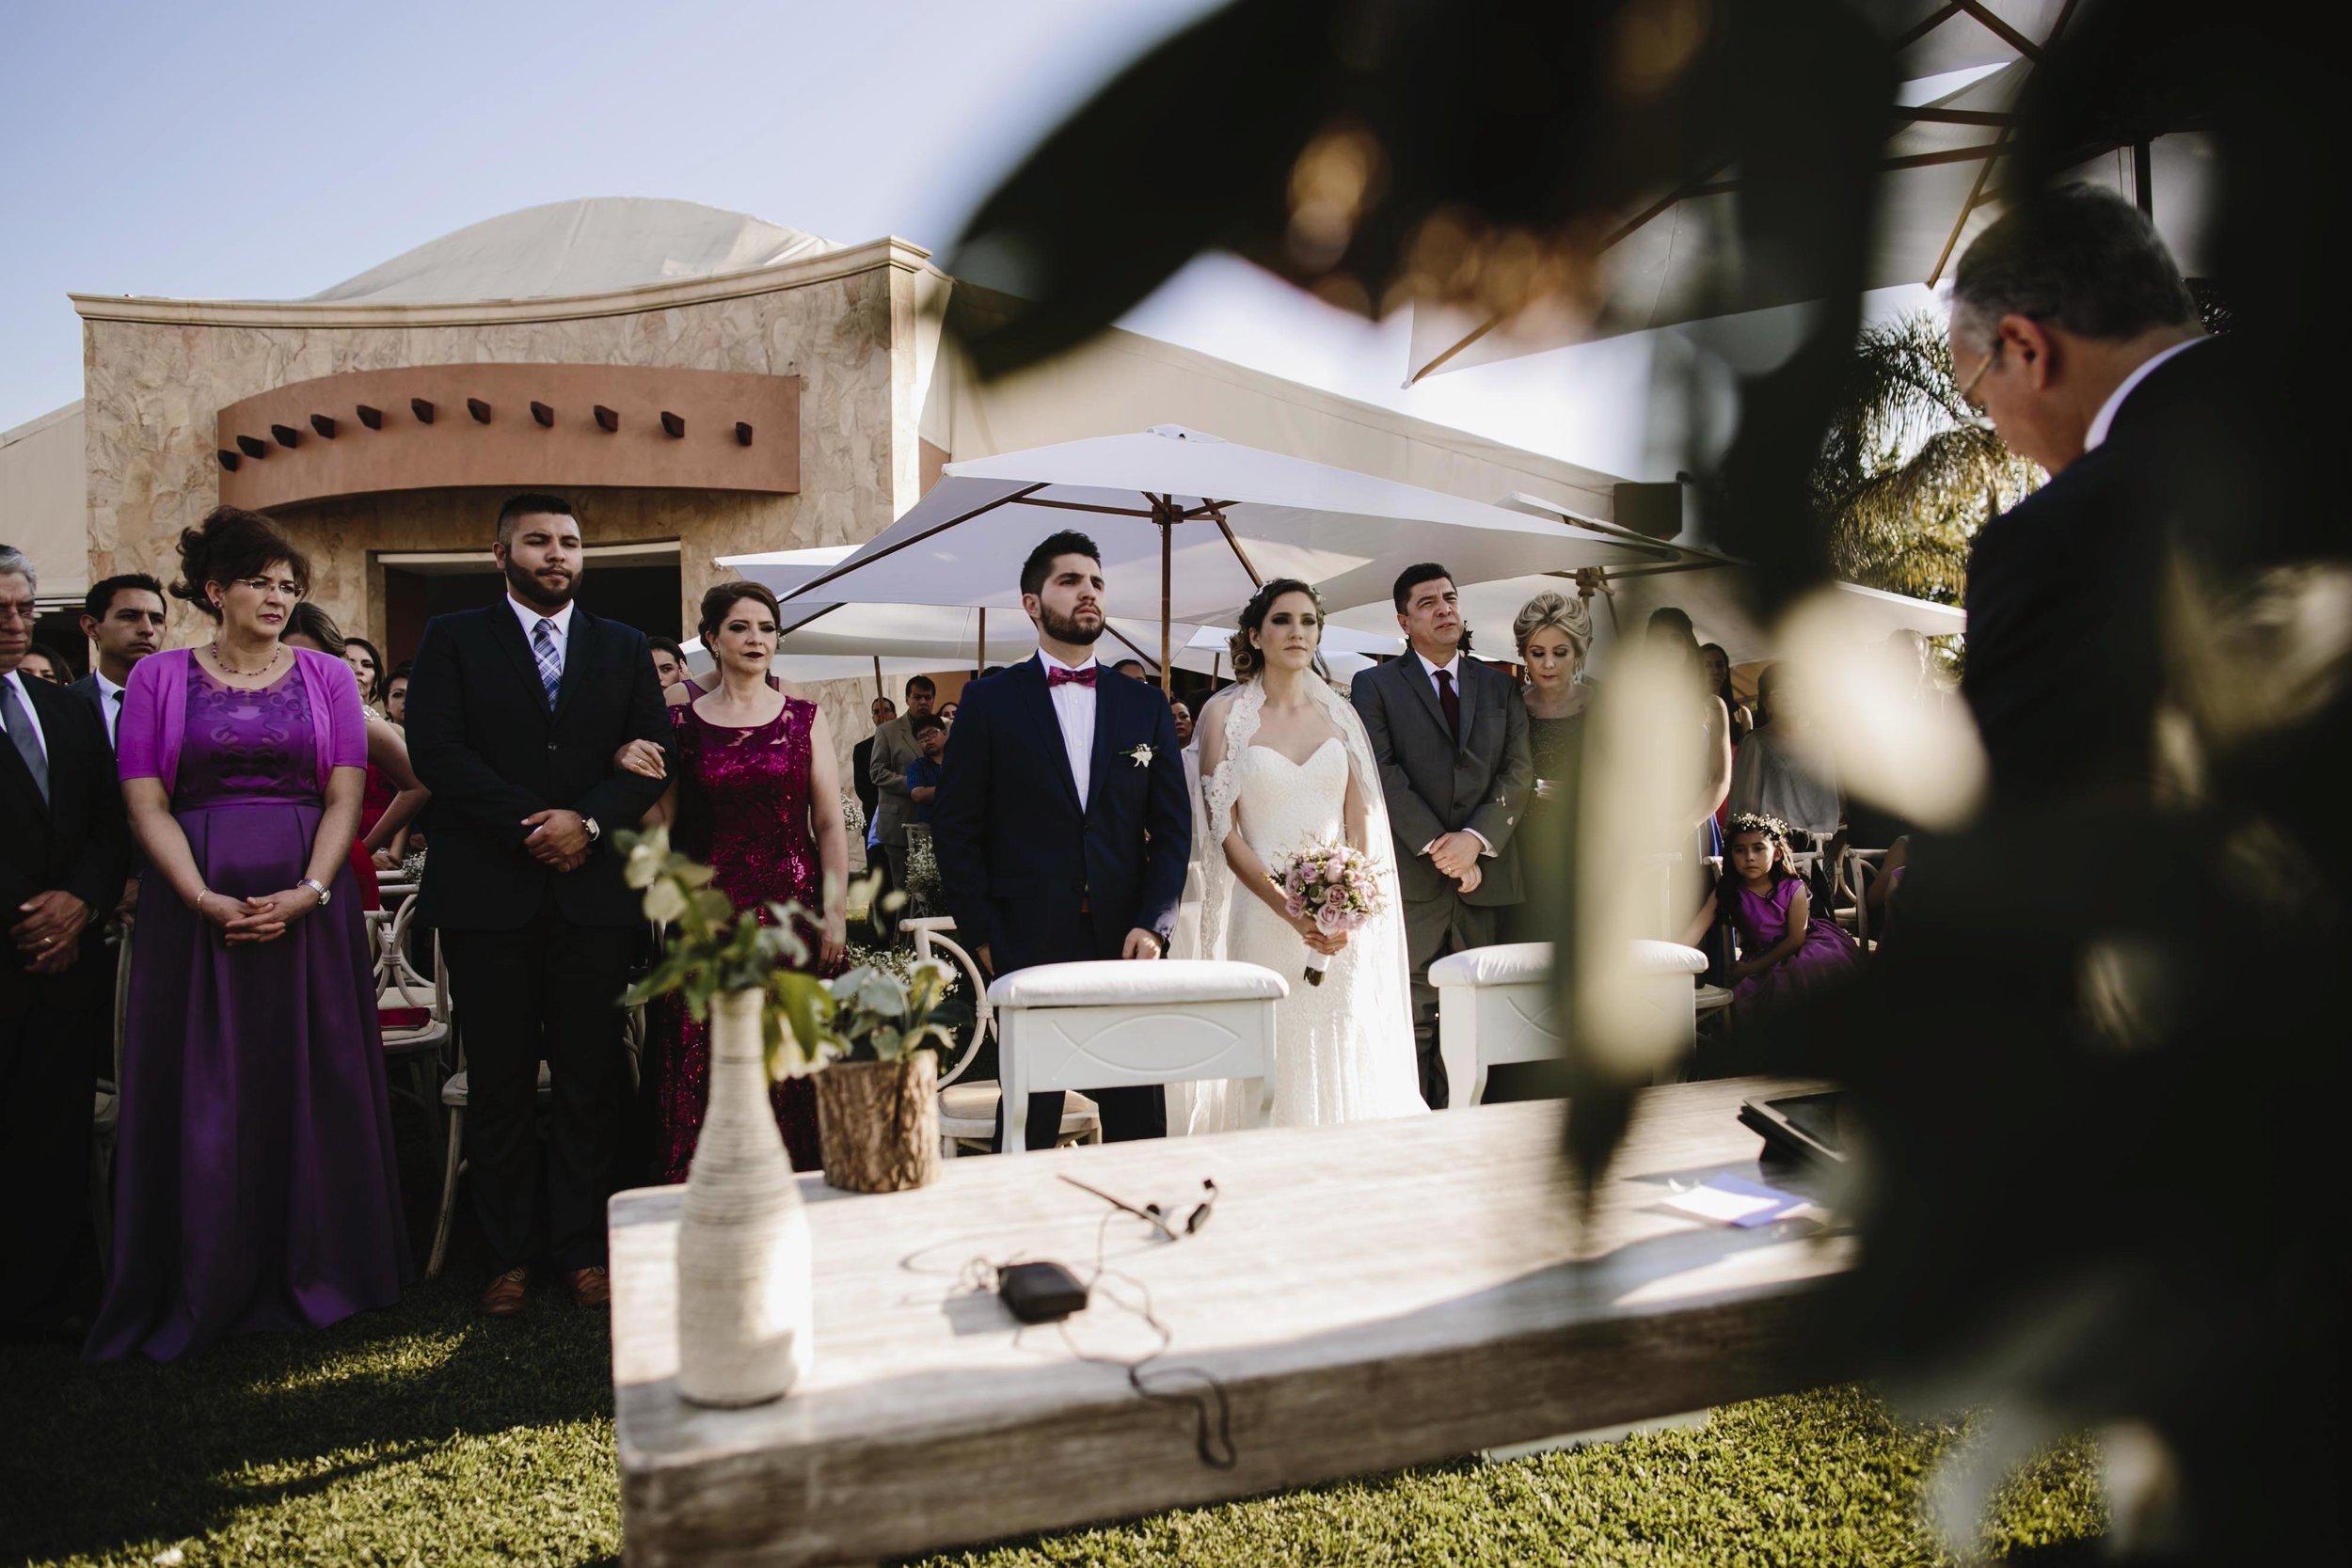 alfonso_flores_destination_wedding_photography_jardin_amarello_cuernavaca55.jpg